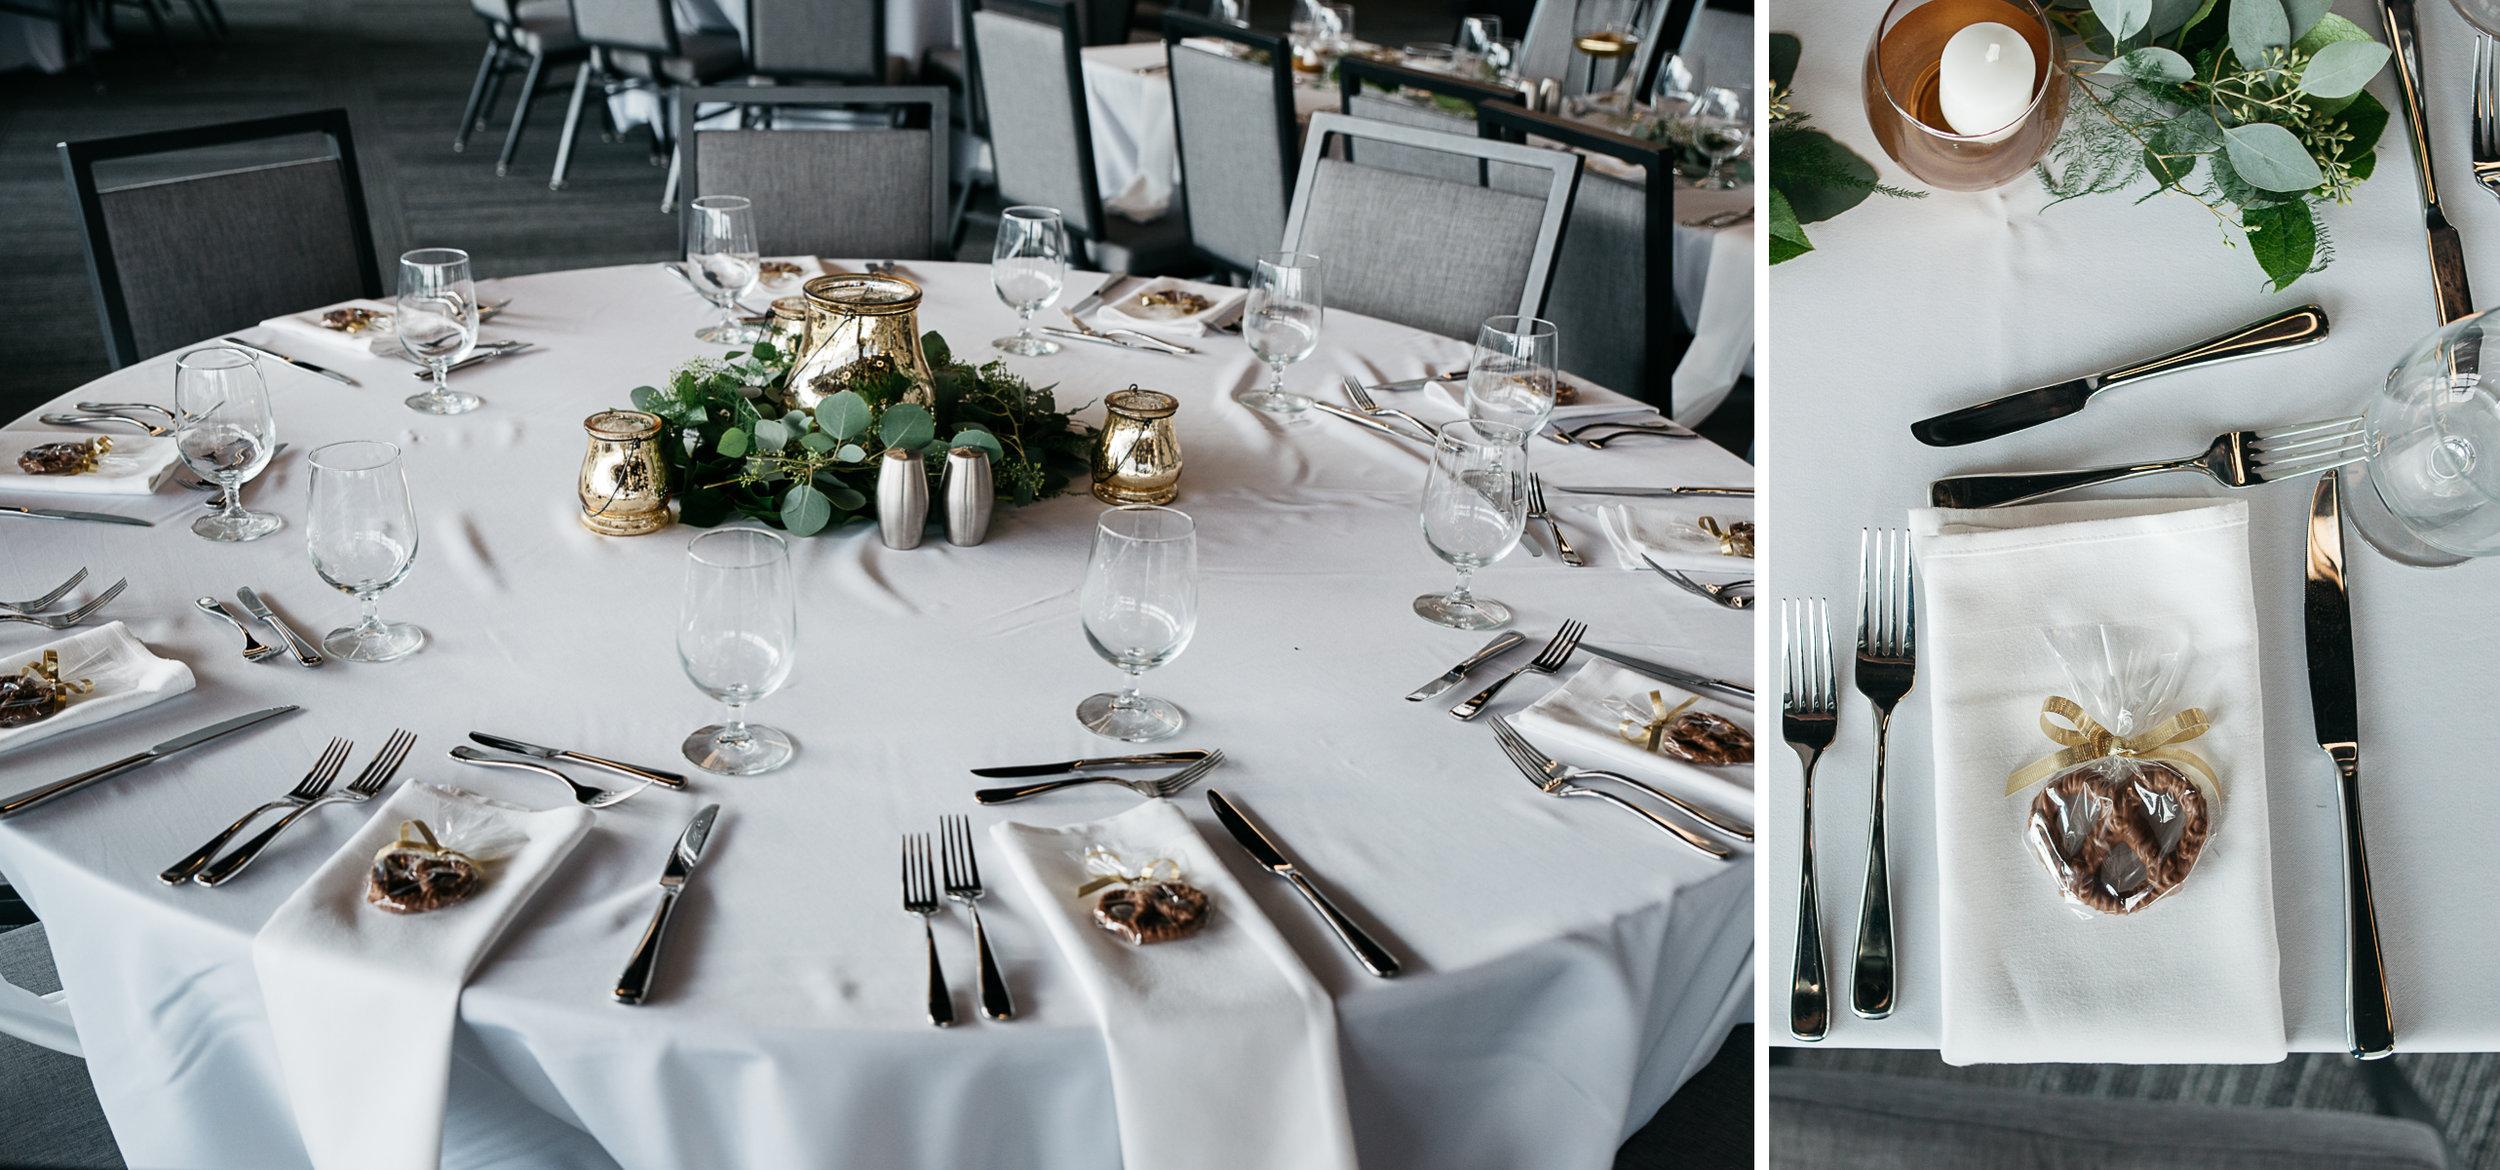 Pointview Hall, Carnegie Science Center Wedding venue.jpg